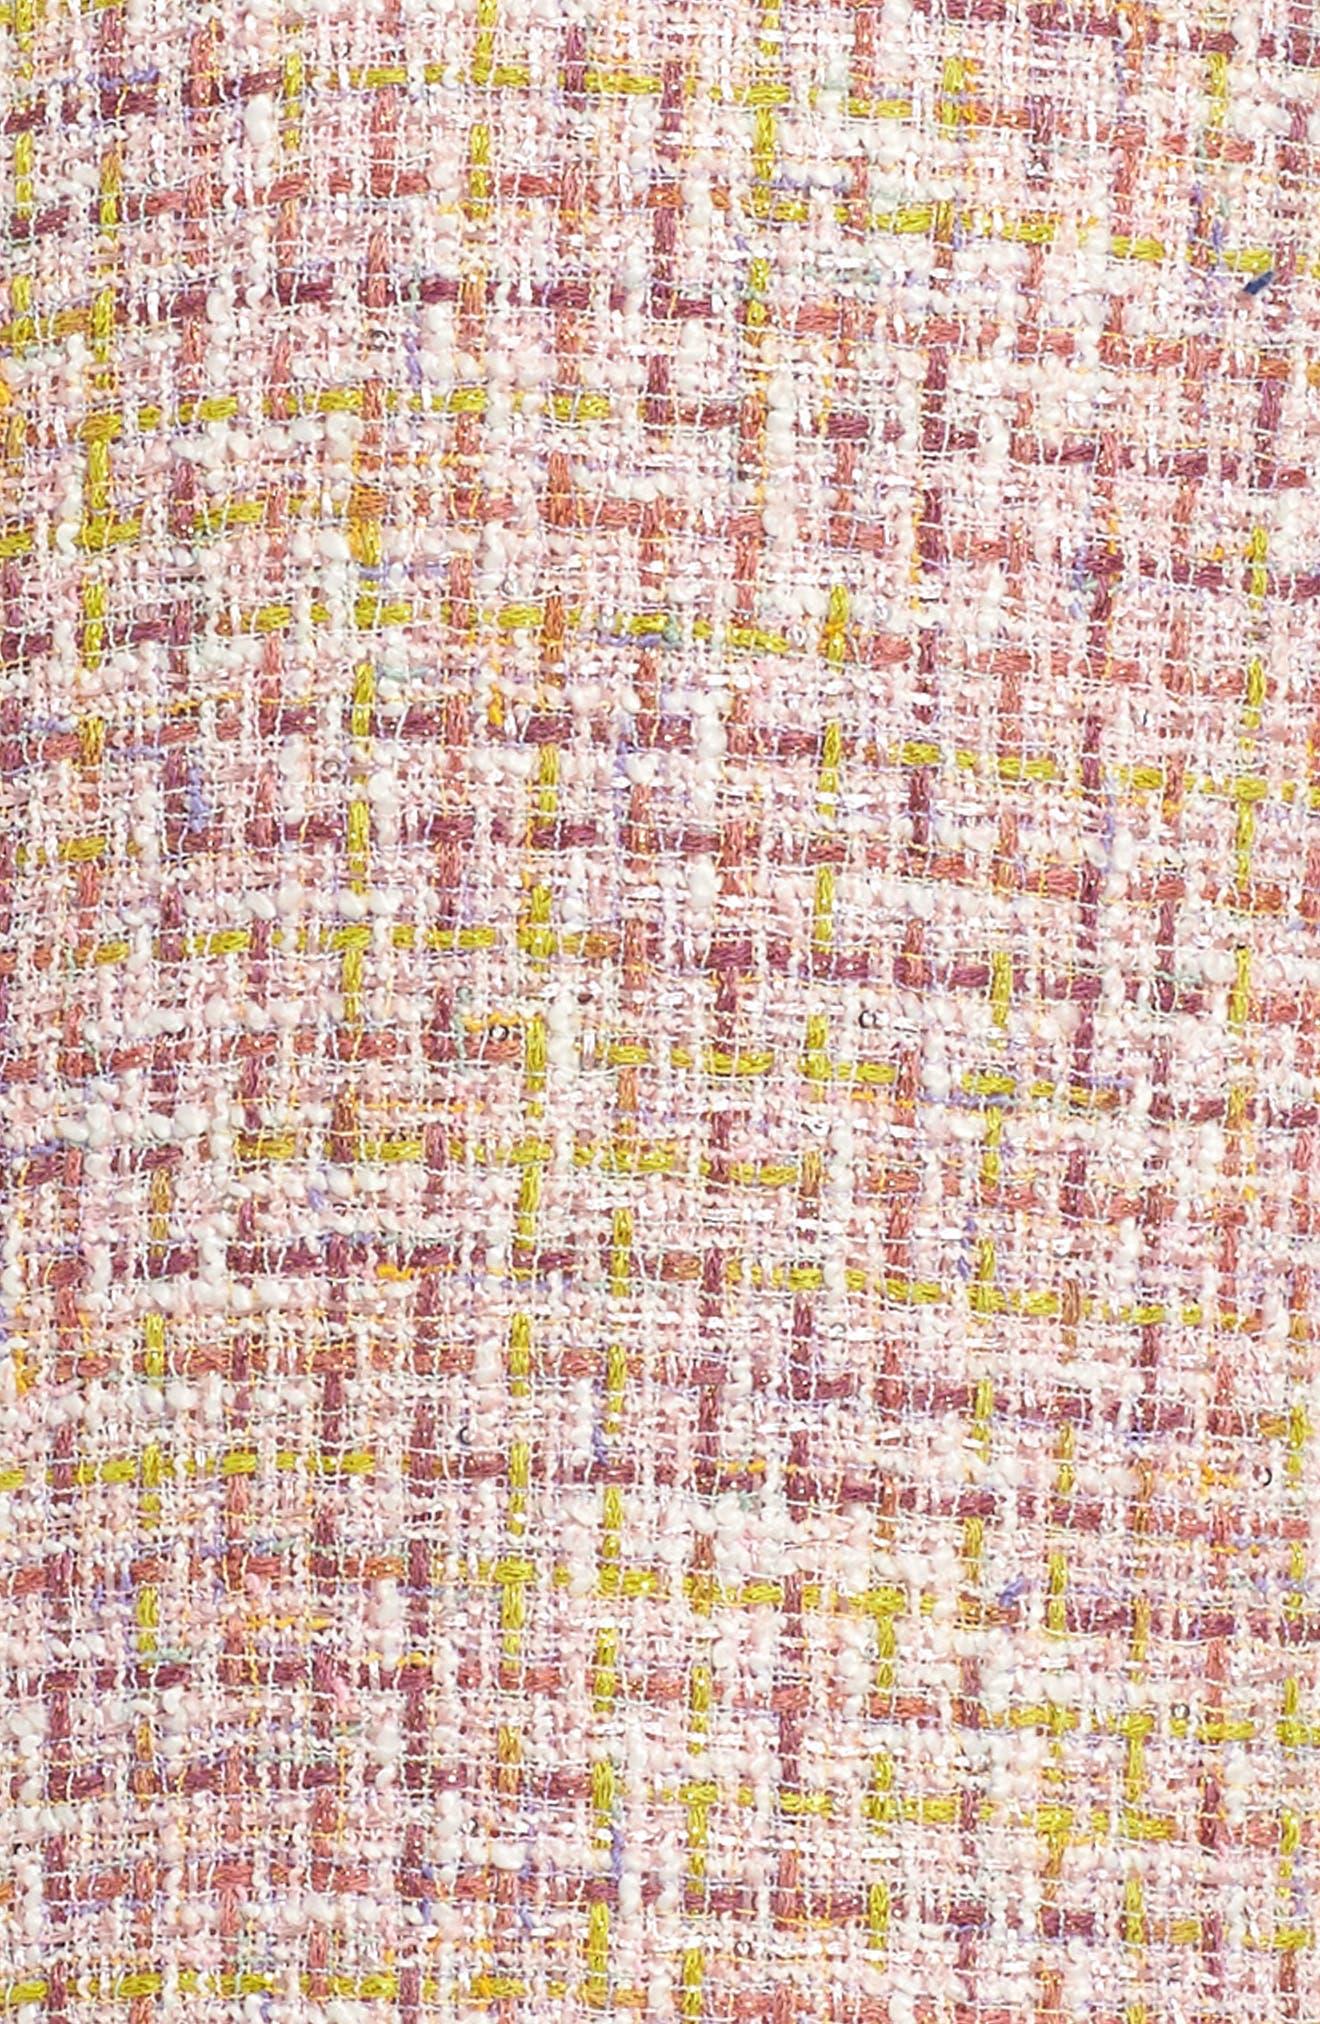 Ringer A-Line Dress,                             Alternate thumbnail 3, color,                             650